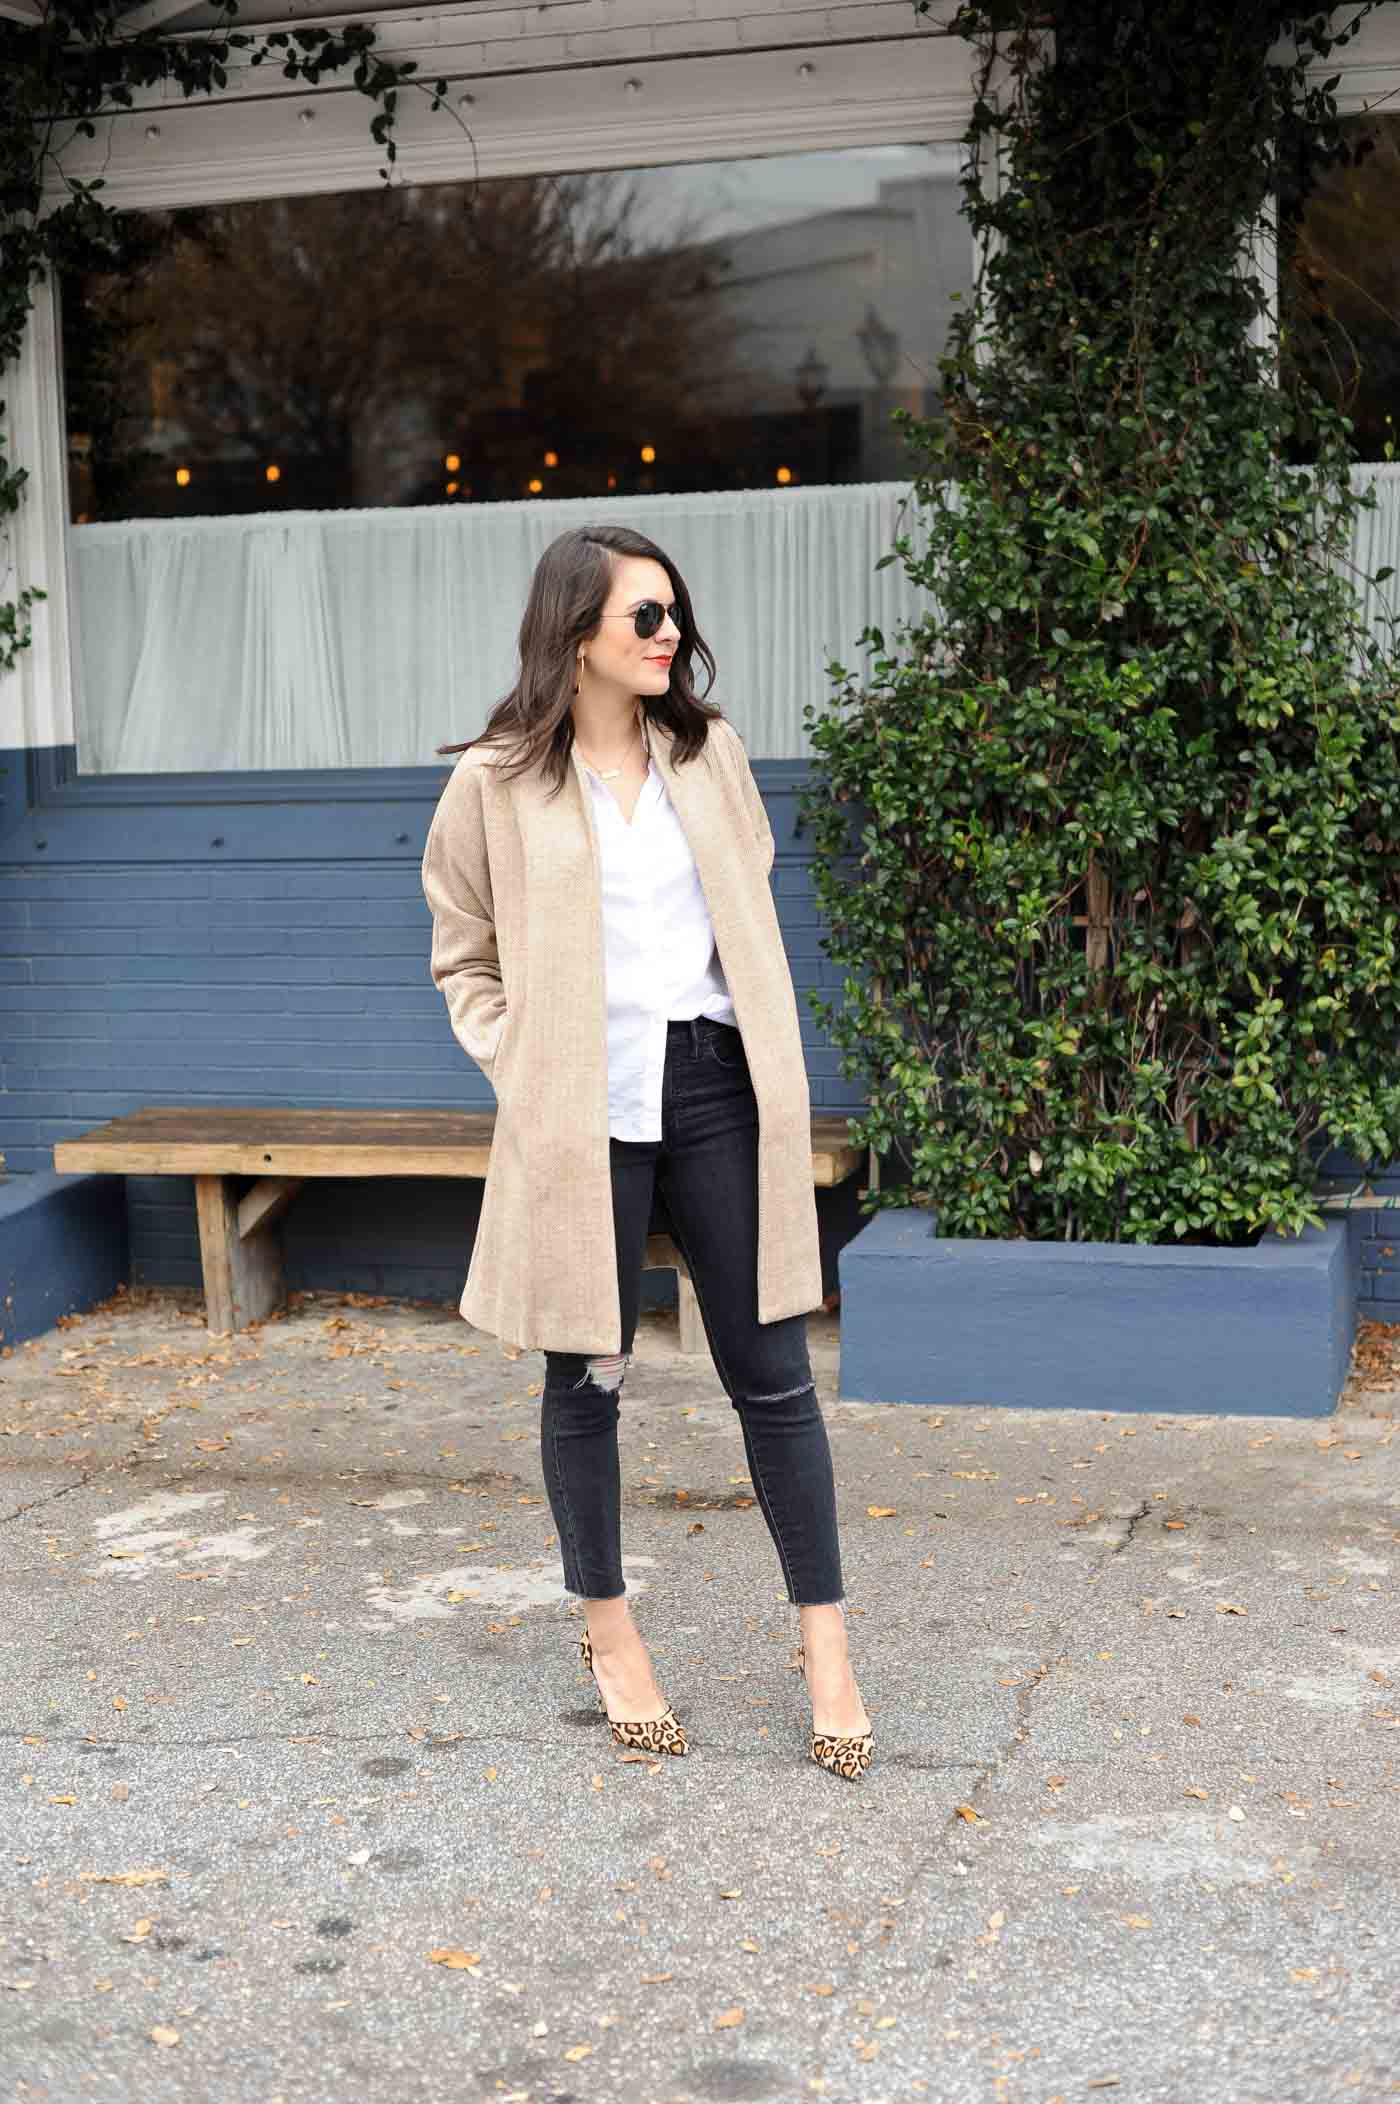 neutral outfit ideas, leopard heels - My Style Vita @mystylevita